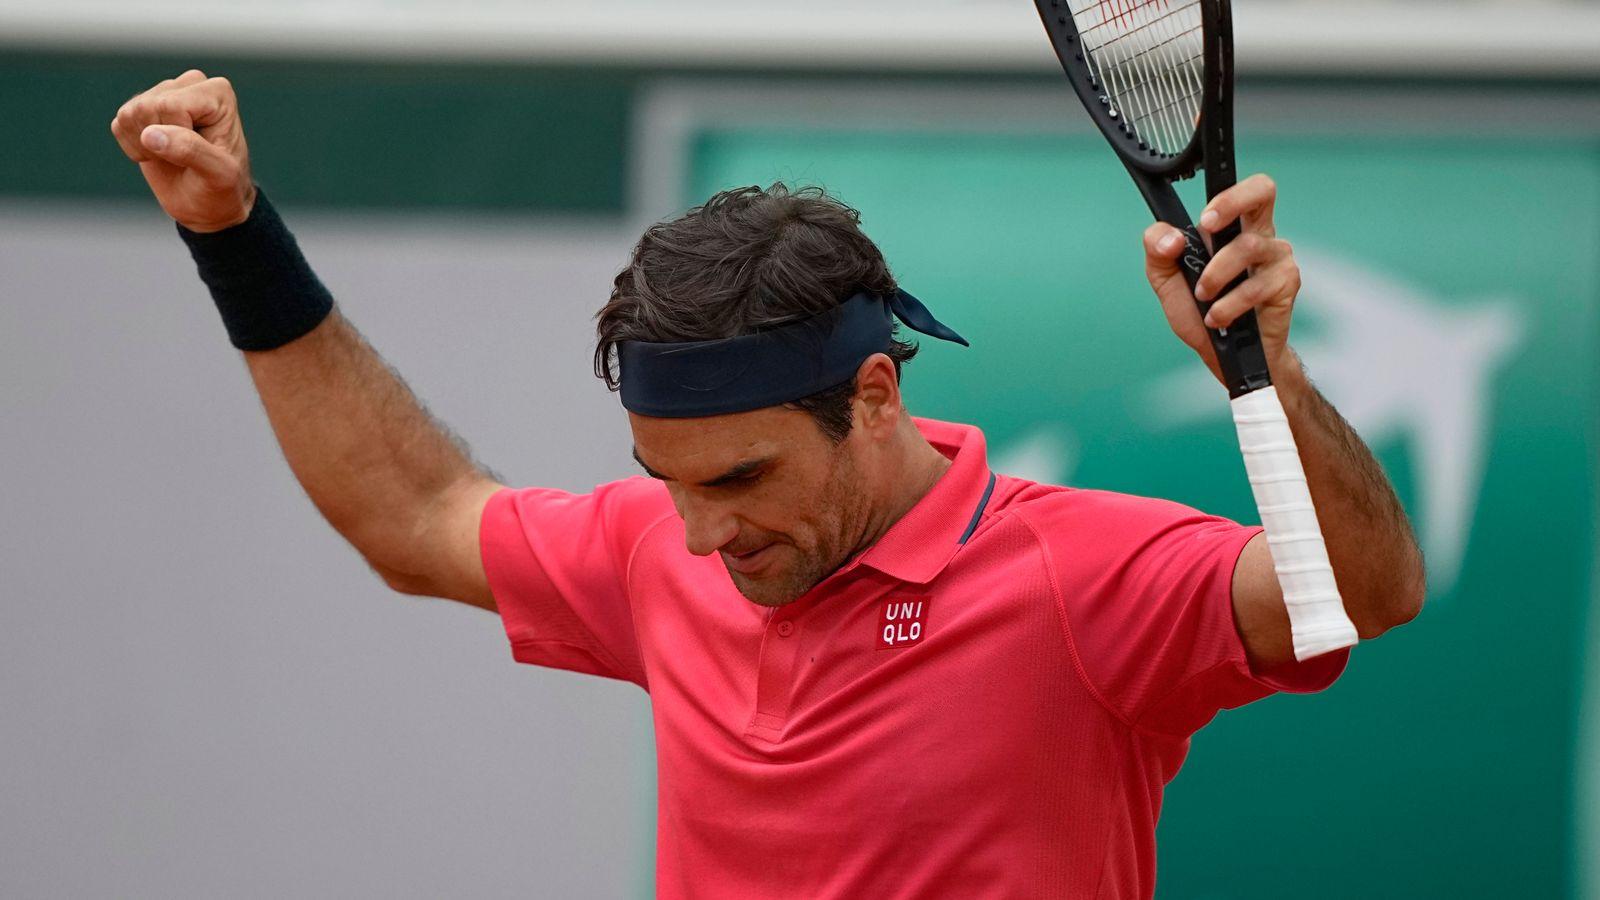 French Open 2021: Roger Federer vs. Dominik Koepfer Tennis Pick and Prediction